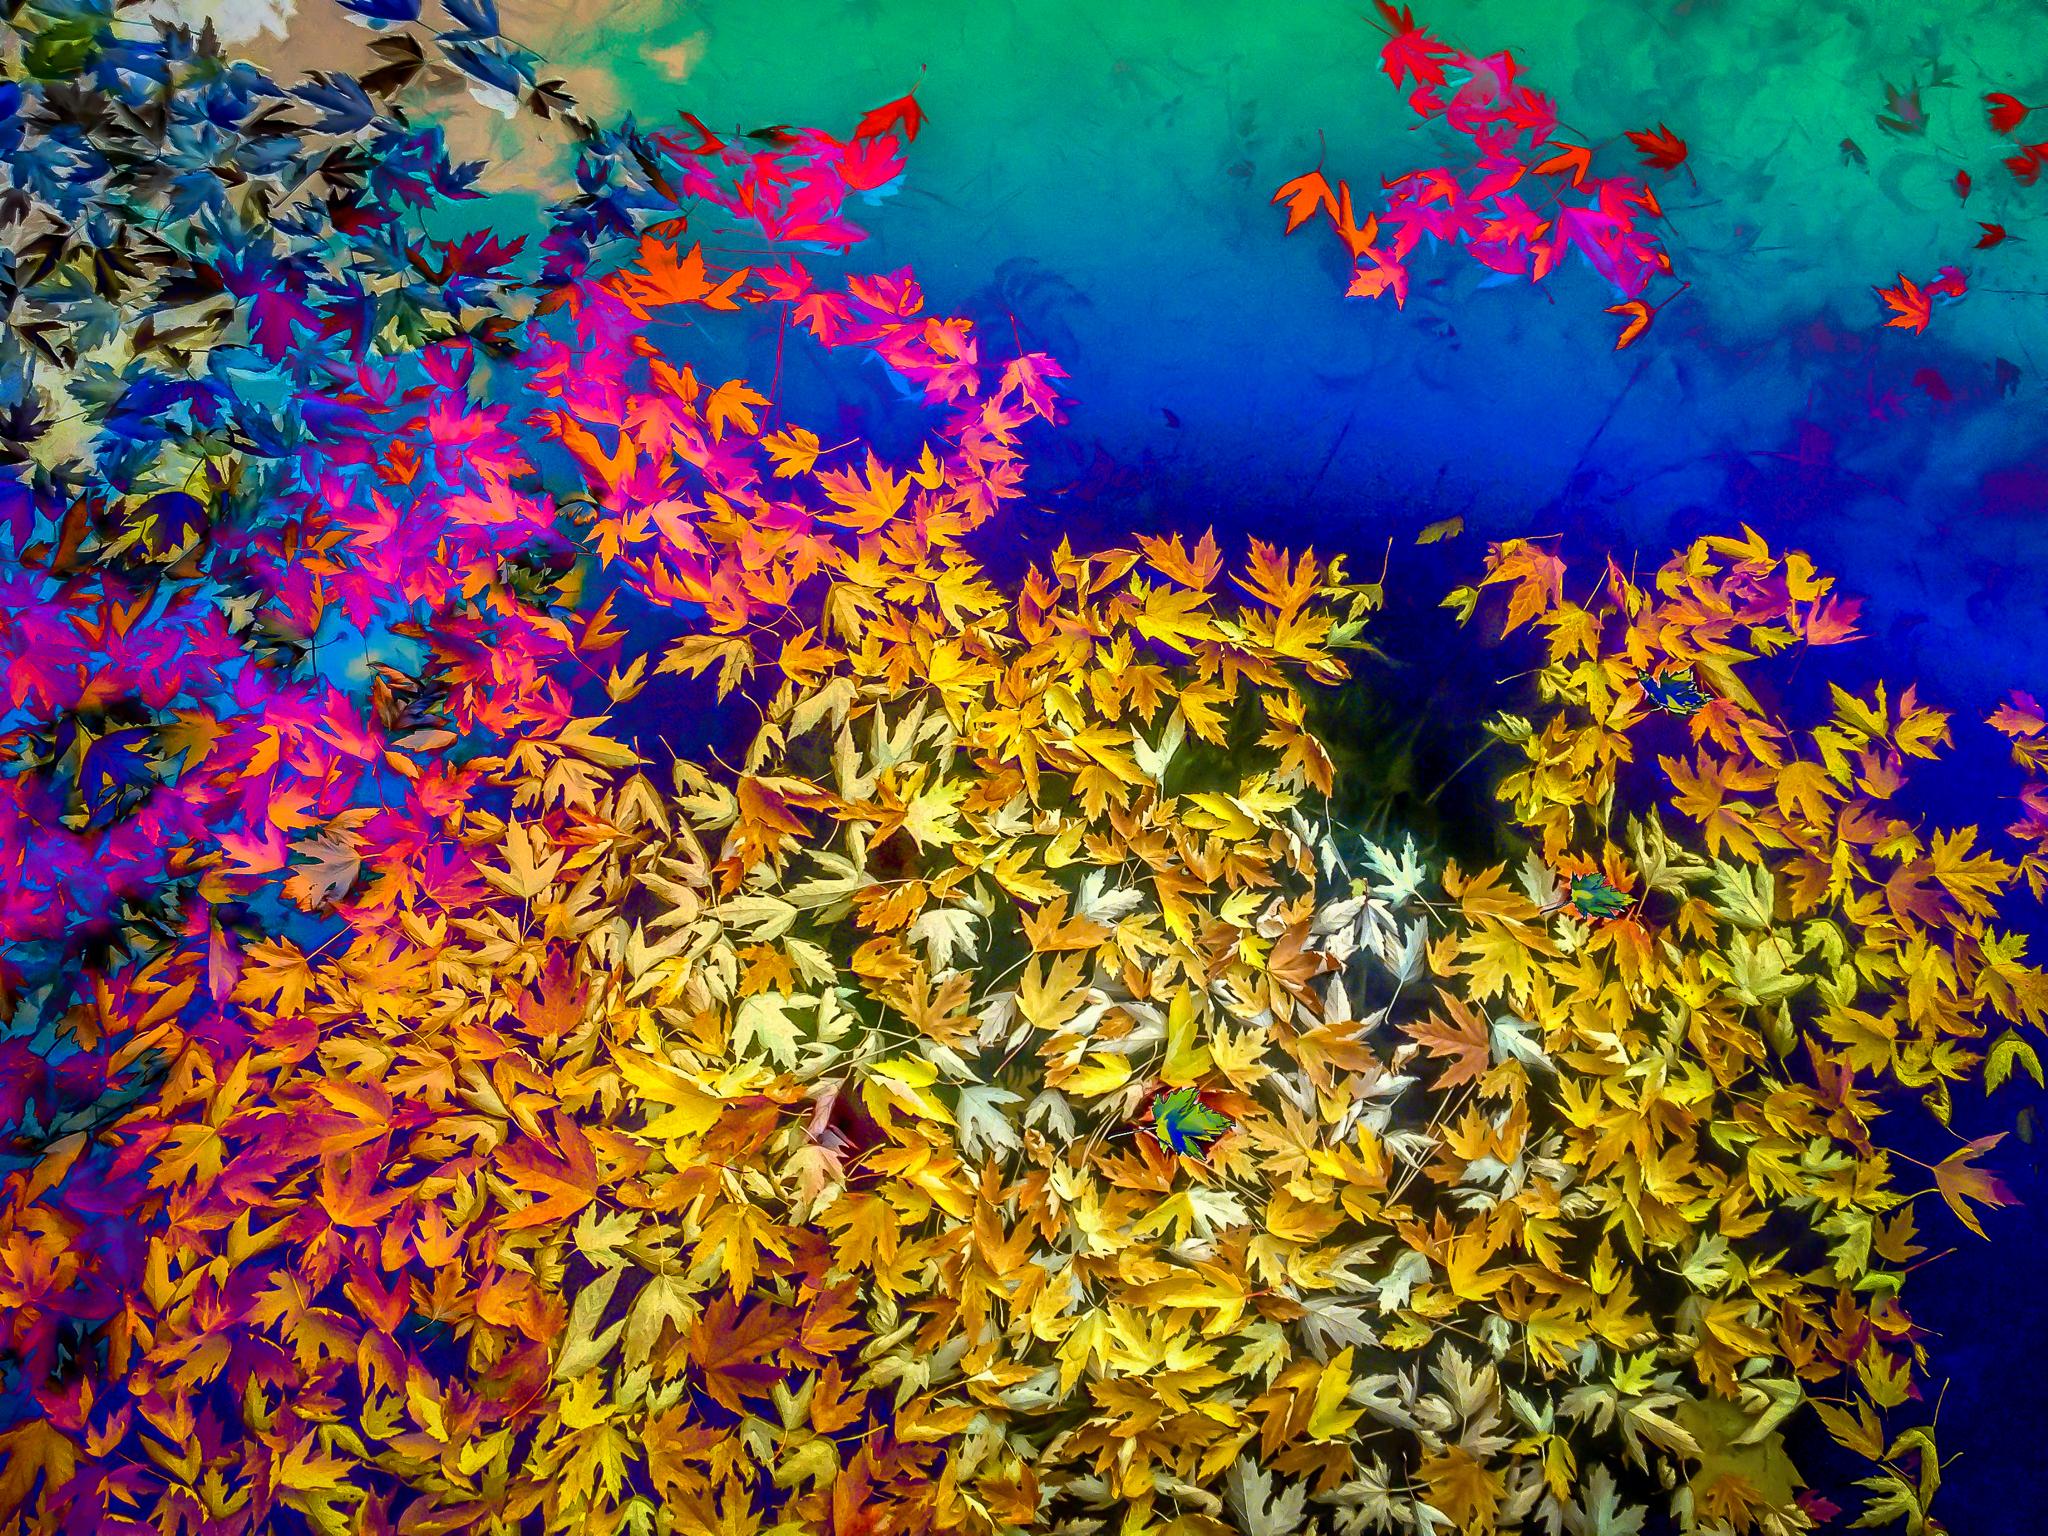 Colorful Fall Leaves digital art